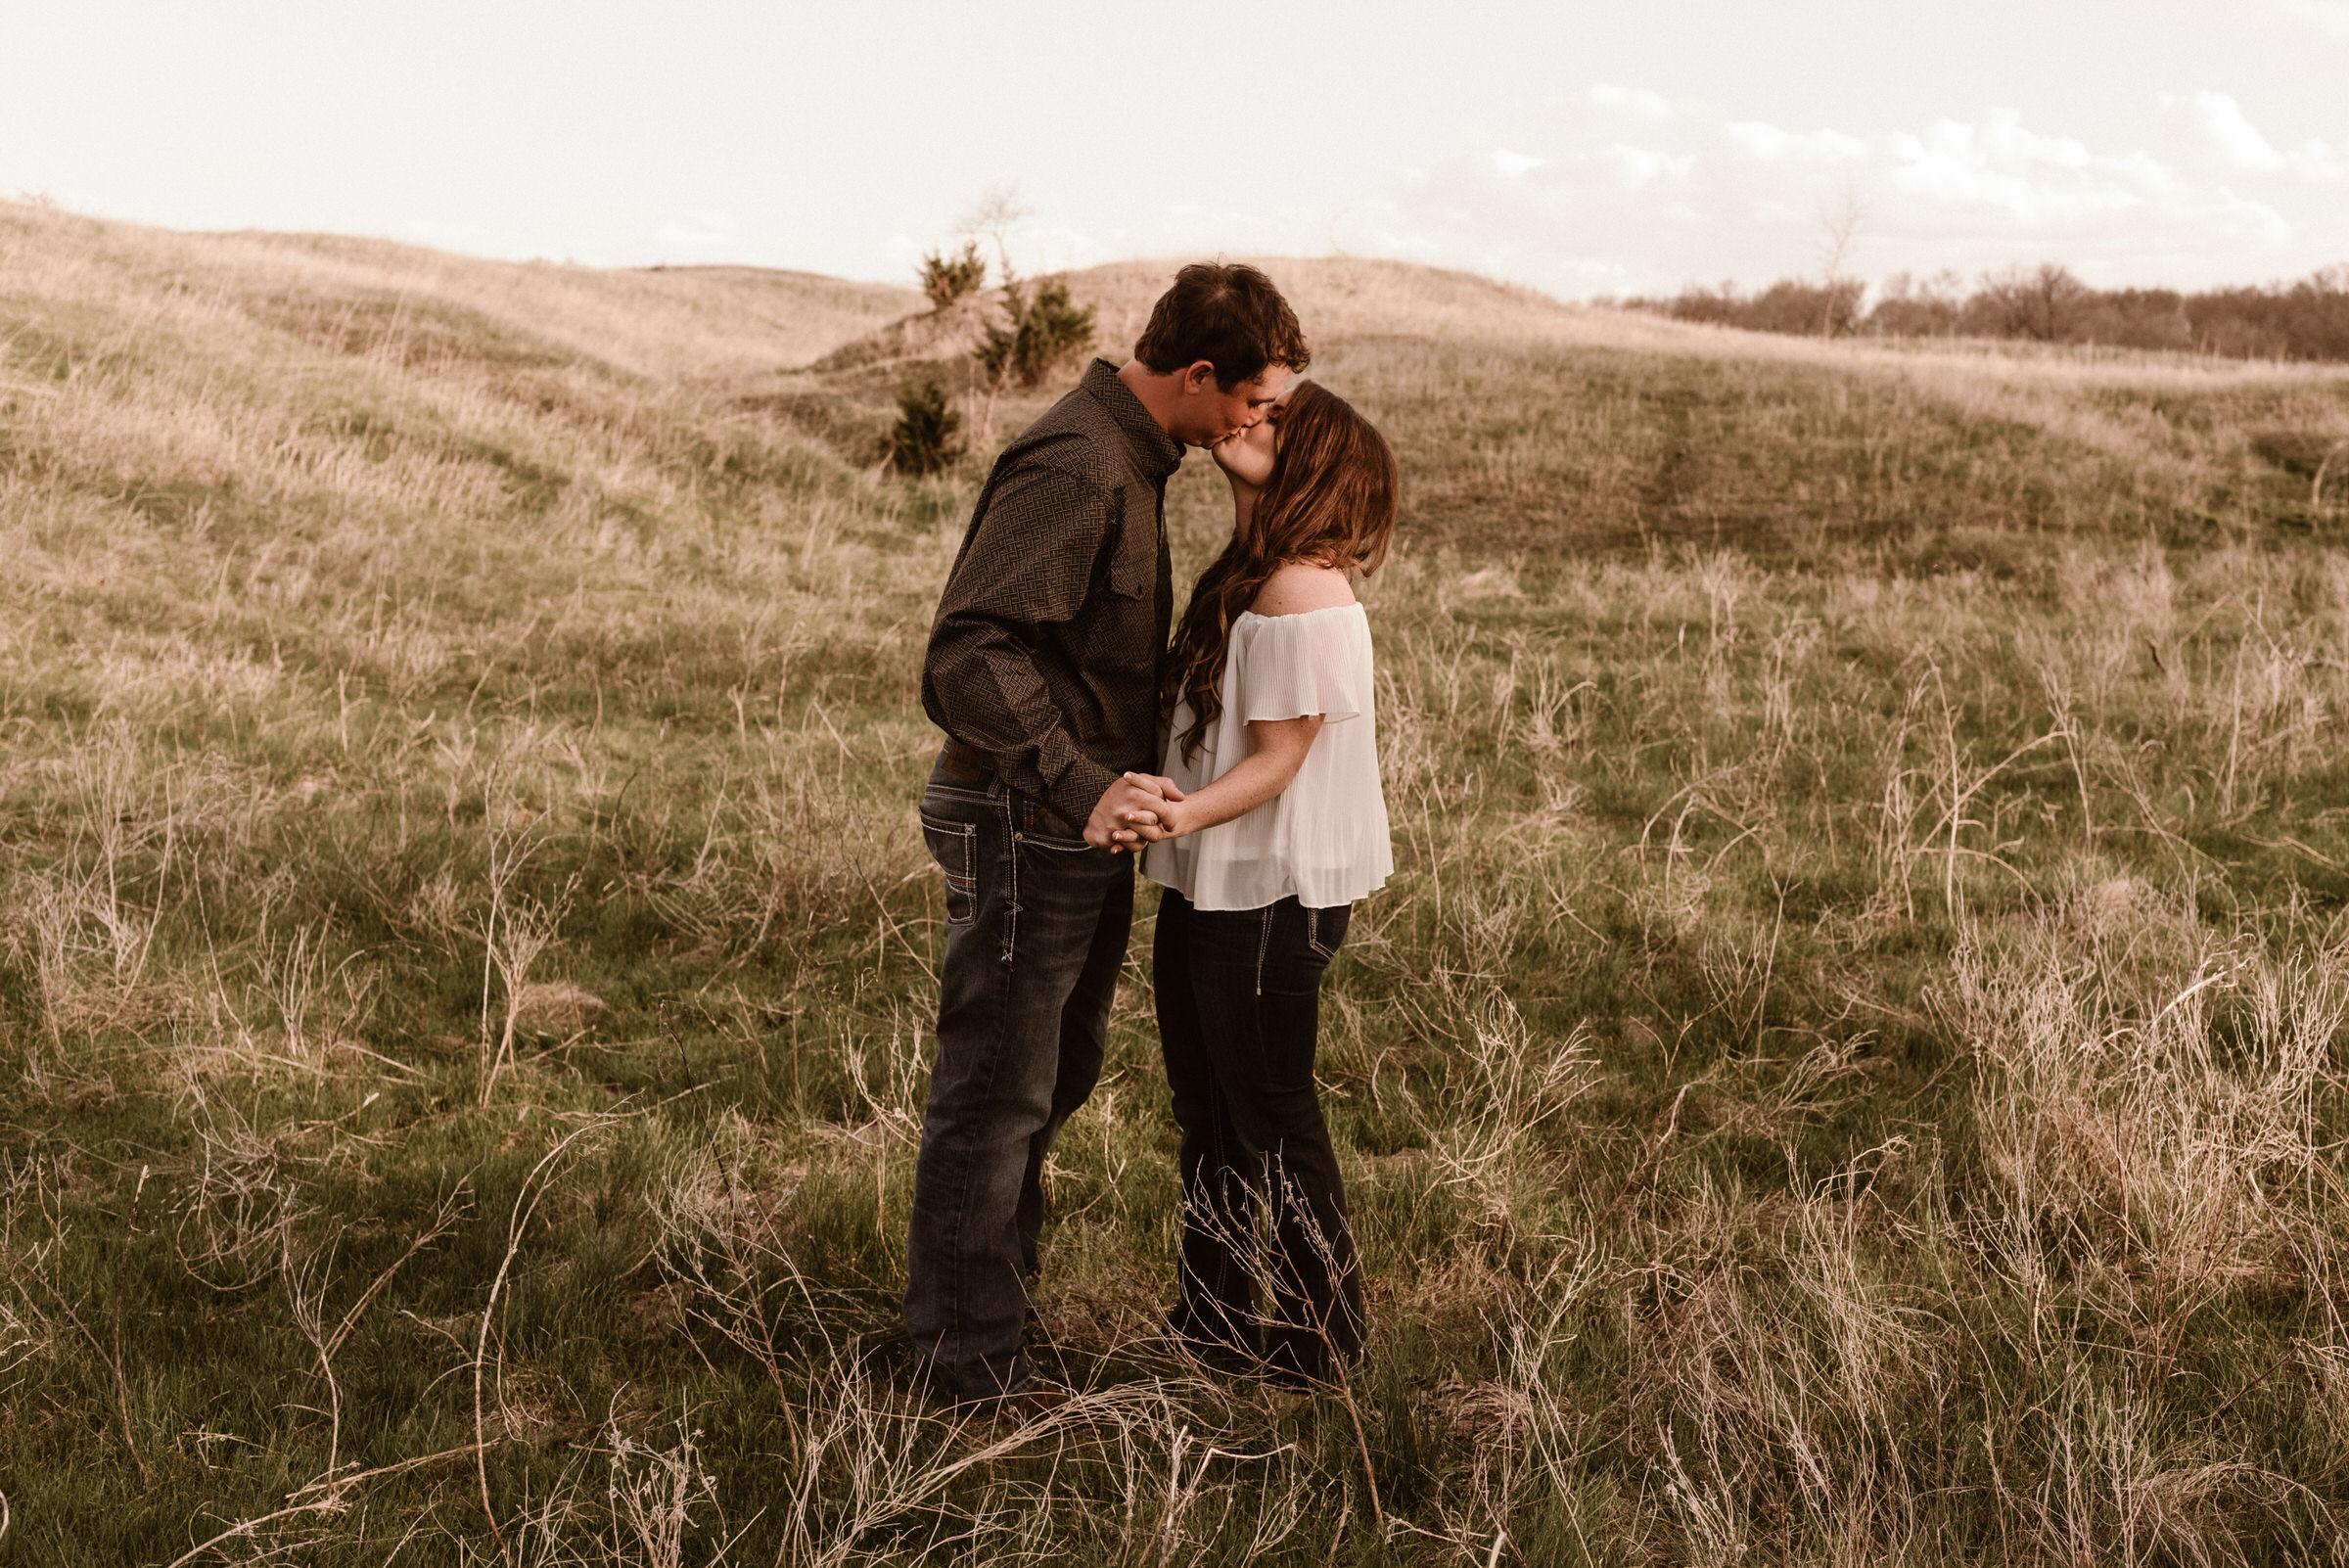 Sandhills-Nebraska-Engagement-Wedding-Photographer-Kaylie-Sirek-Photography-007.jpg